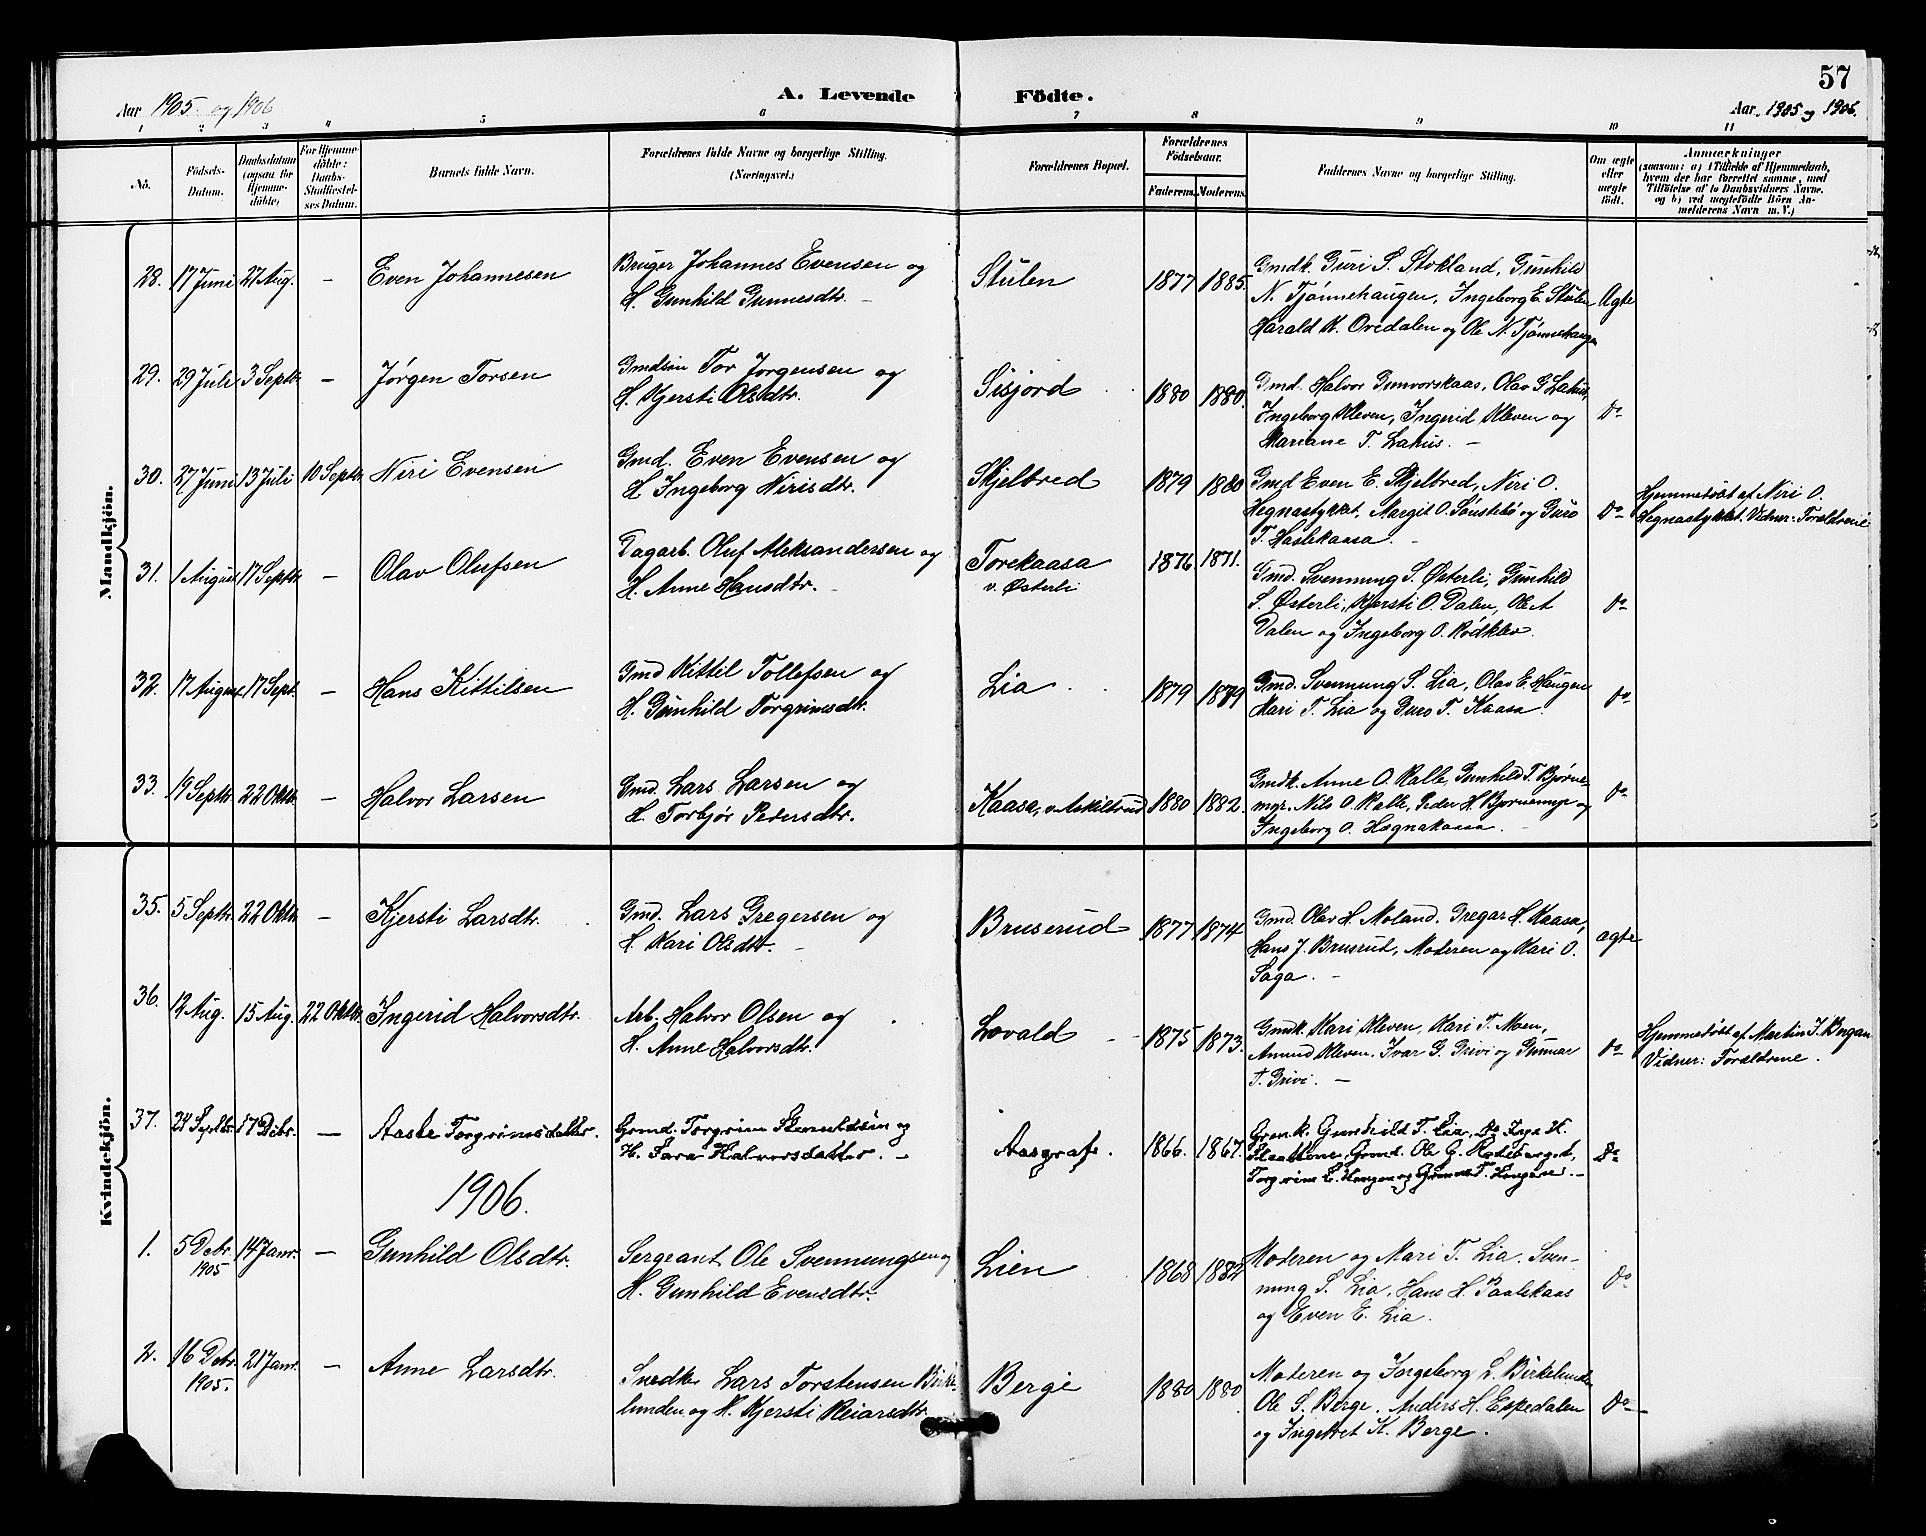 SAKO, Bø kirkebøker, G/Ga/L0006: Klokkerbok nr. 6, 1898-1909, s. 57